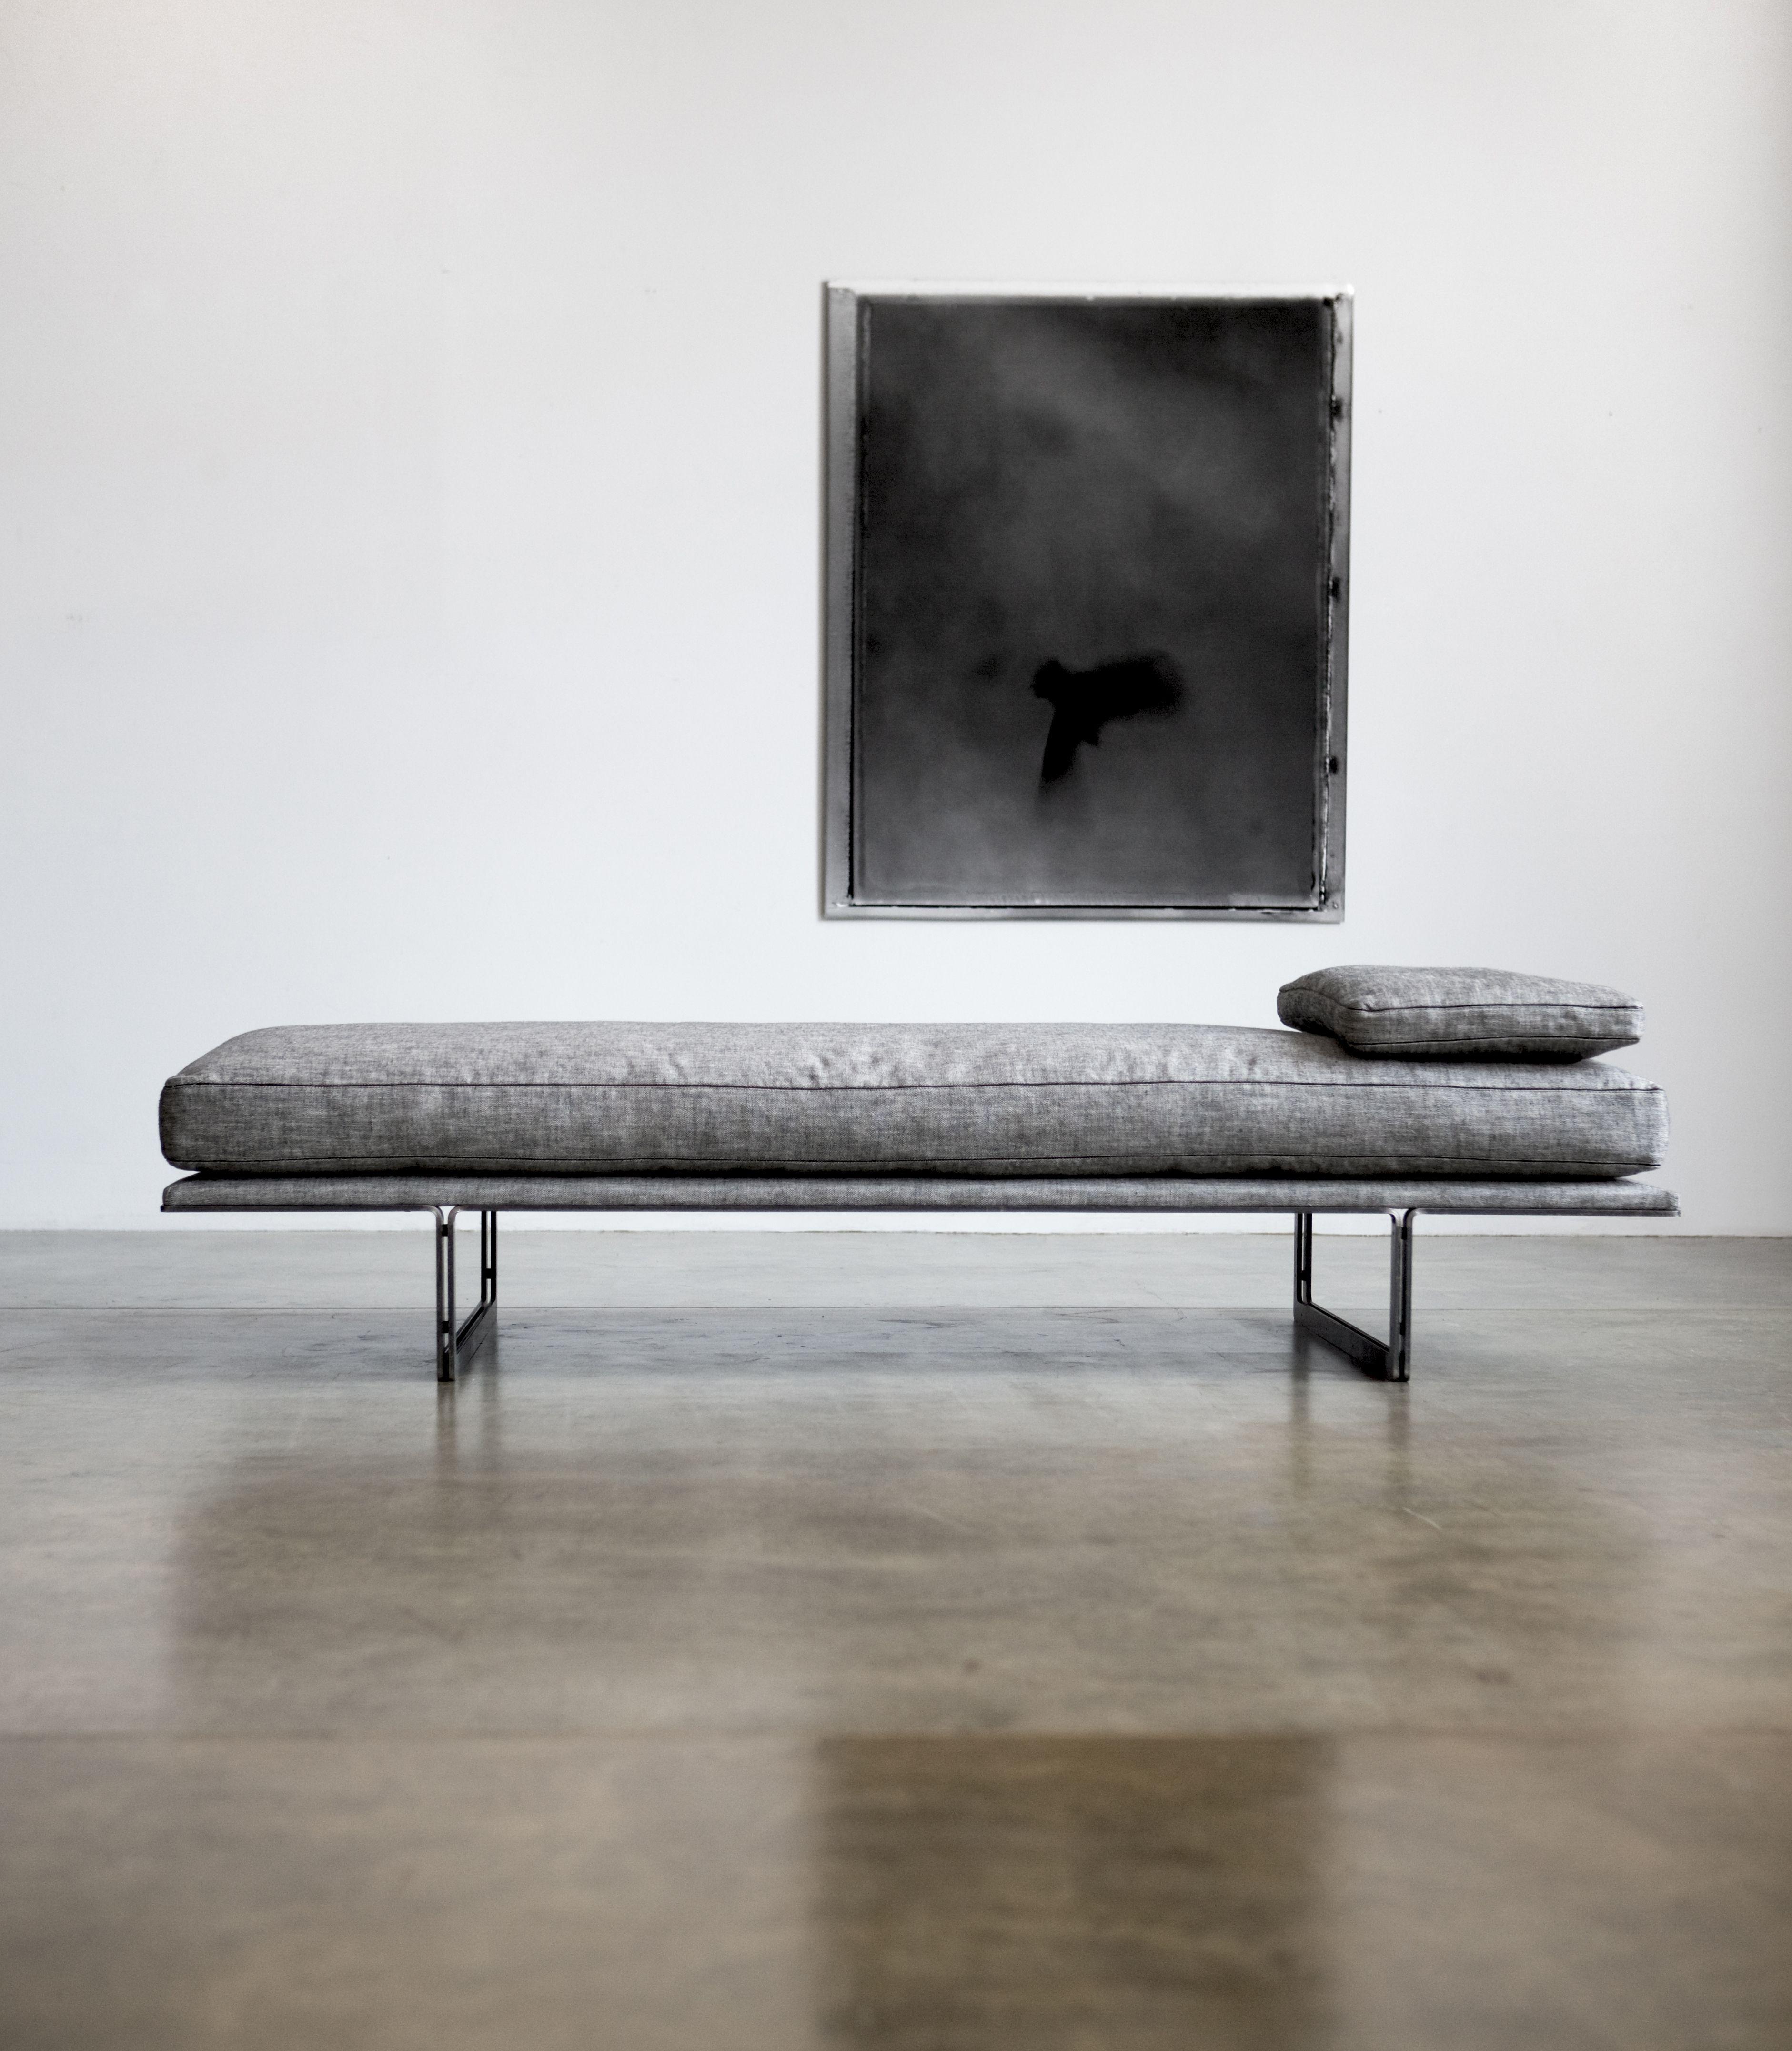 oscar lit de jour photo by andre. Black Bedroom Furniture Sets. Home Design Ideas